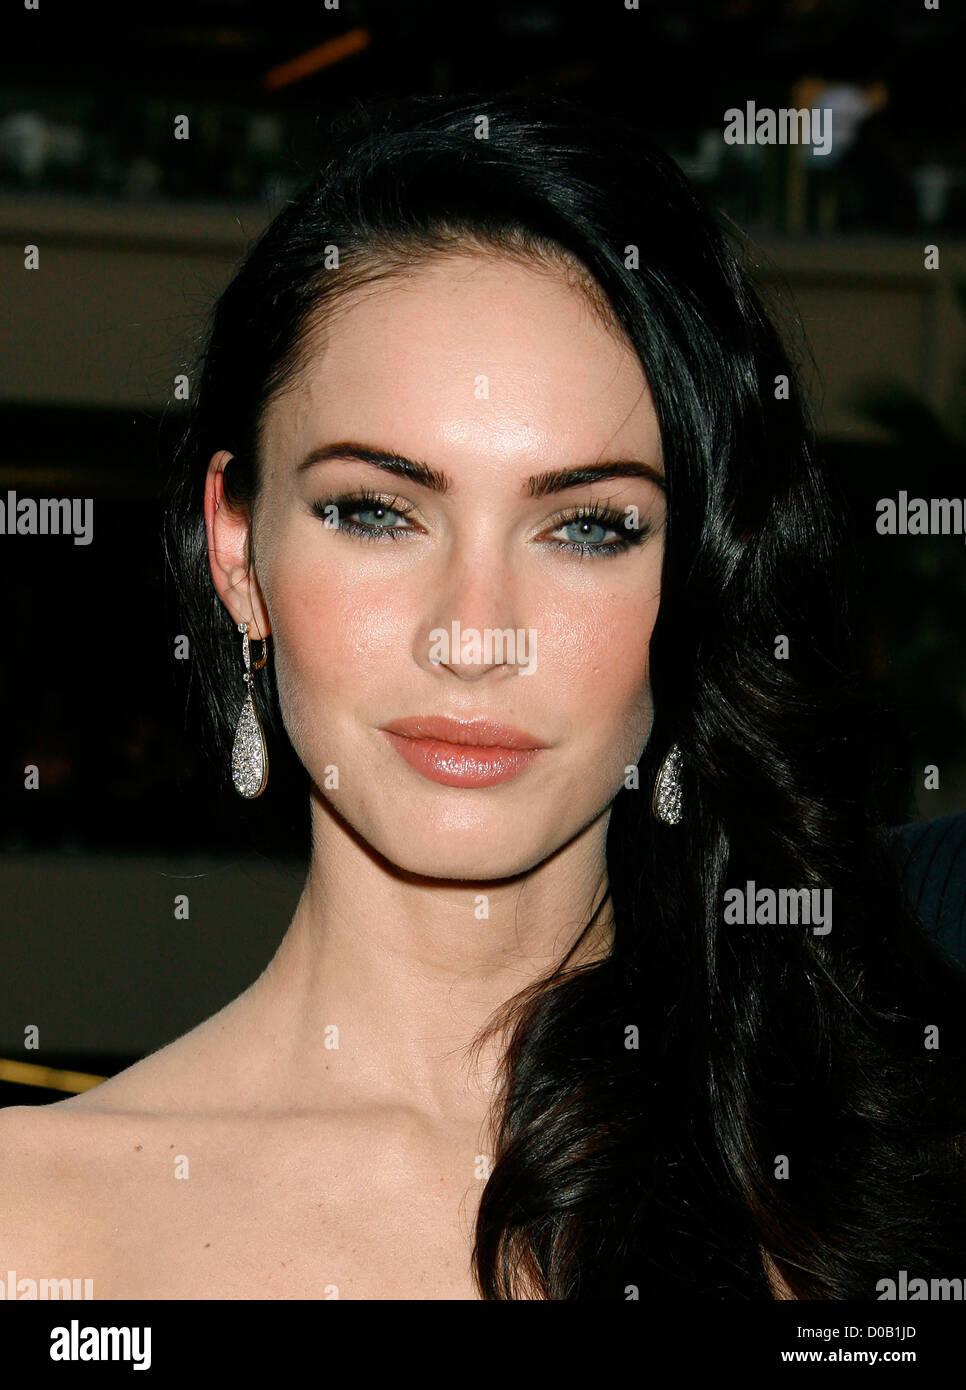 MEGAN FOX US film actress in September 2009. Photo Jeffrey Mayer - Stock Image